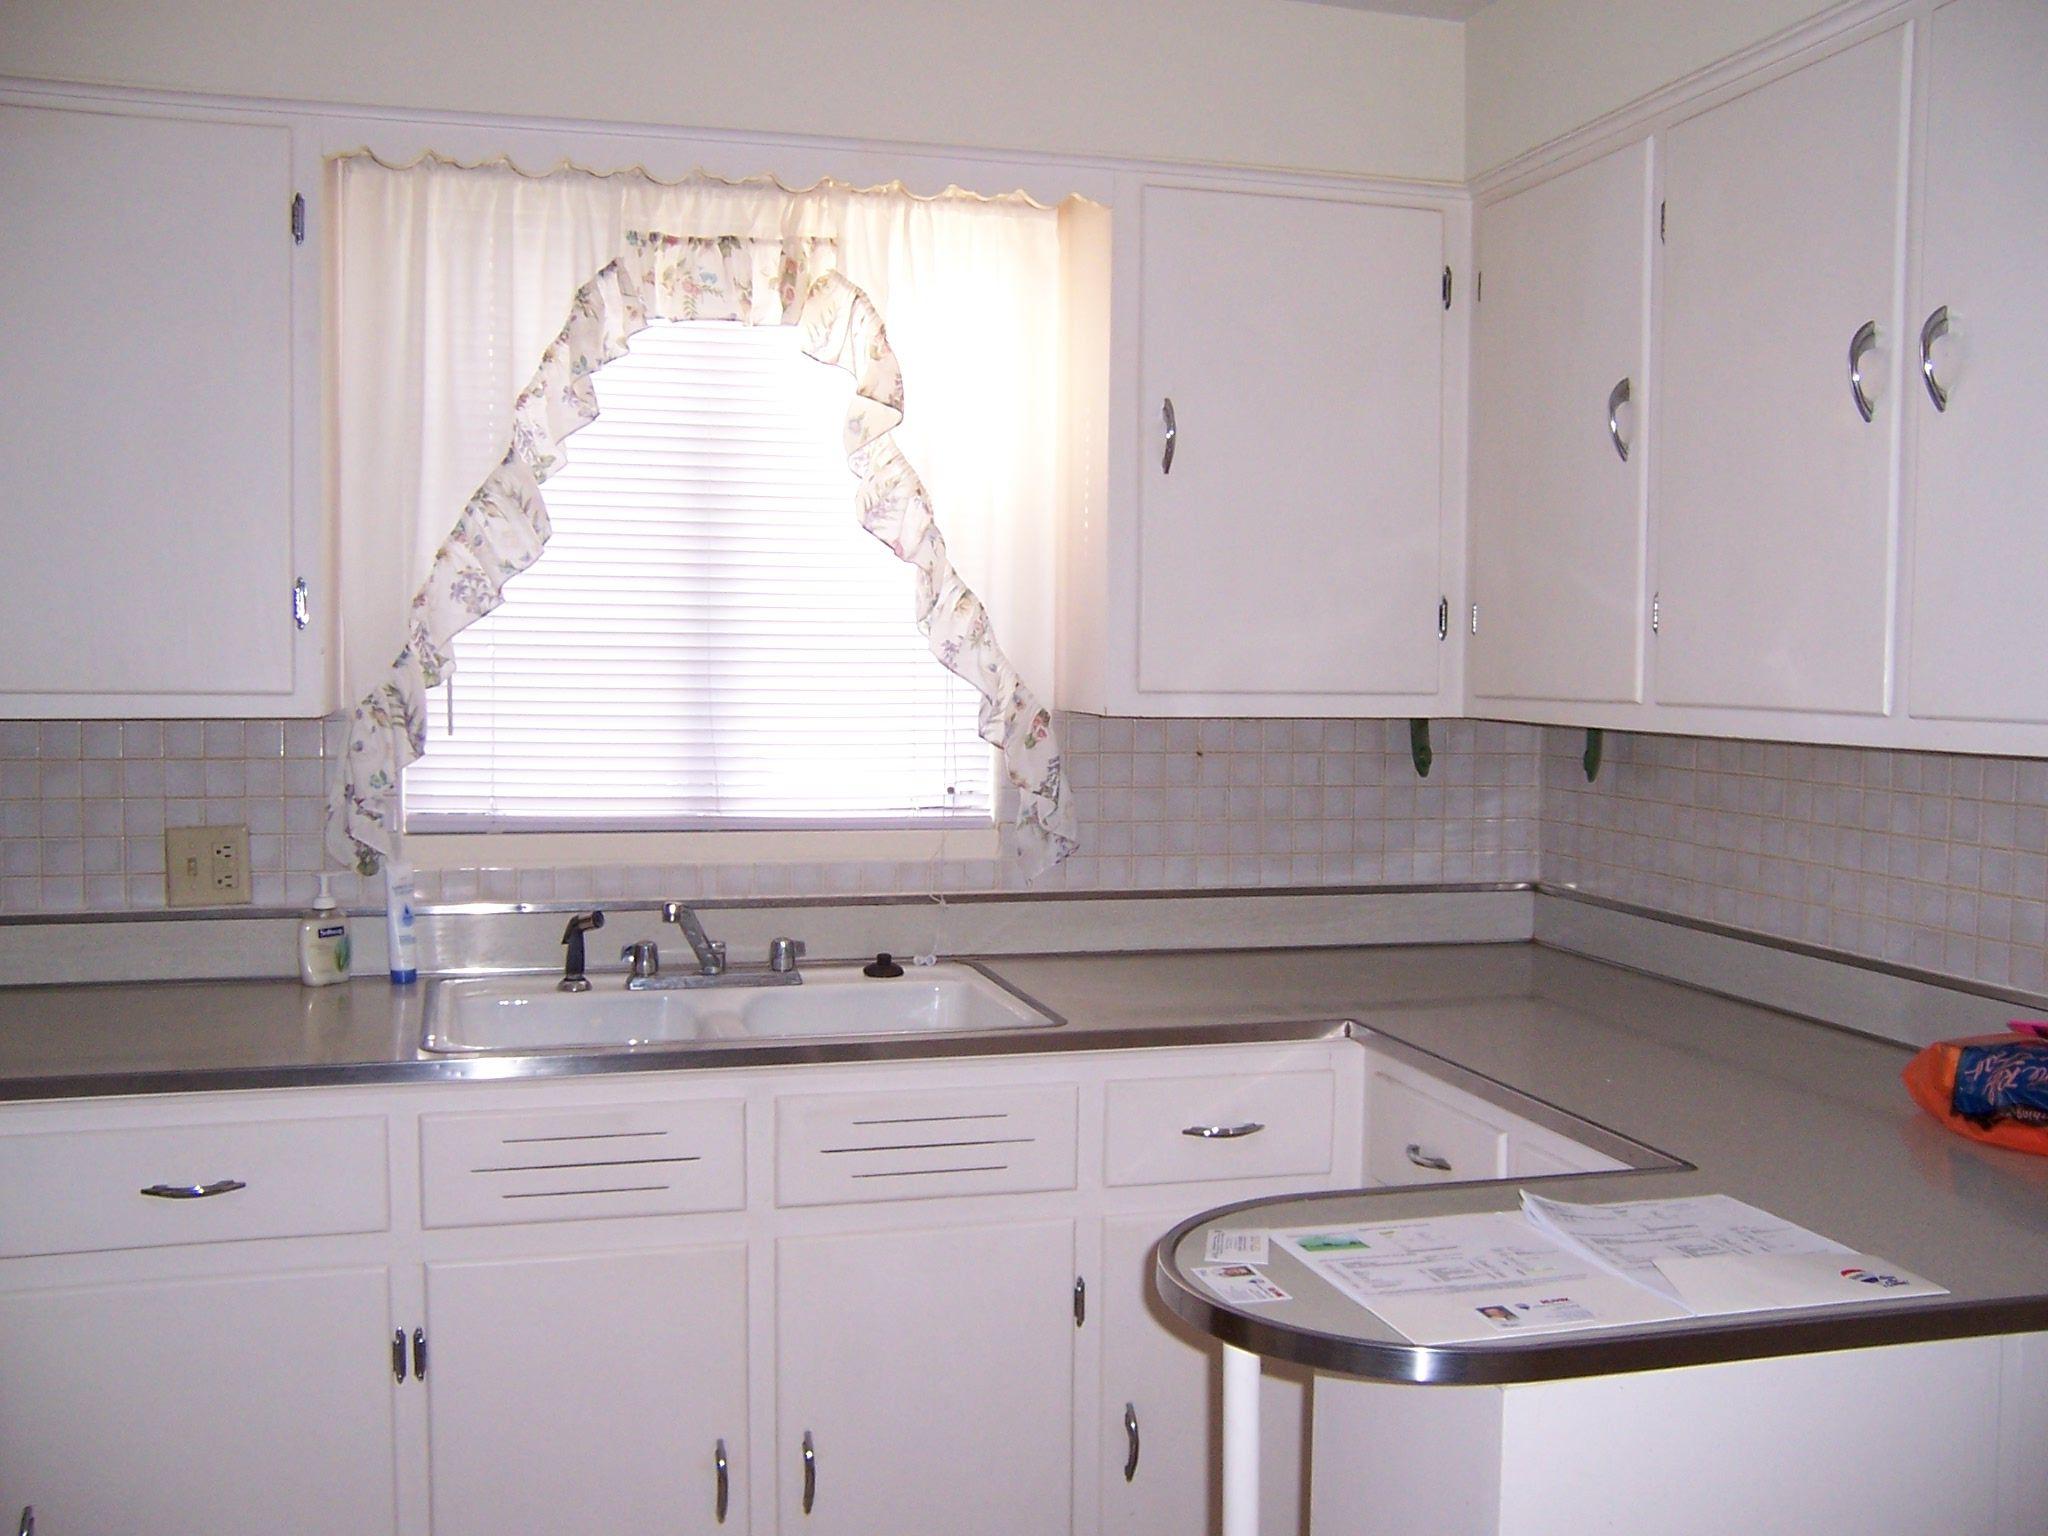 Original 1940s kitchen...this is so close to my kitchen, same ...